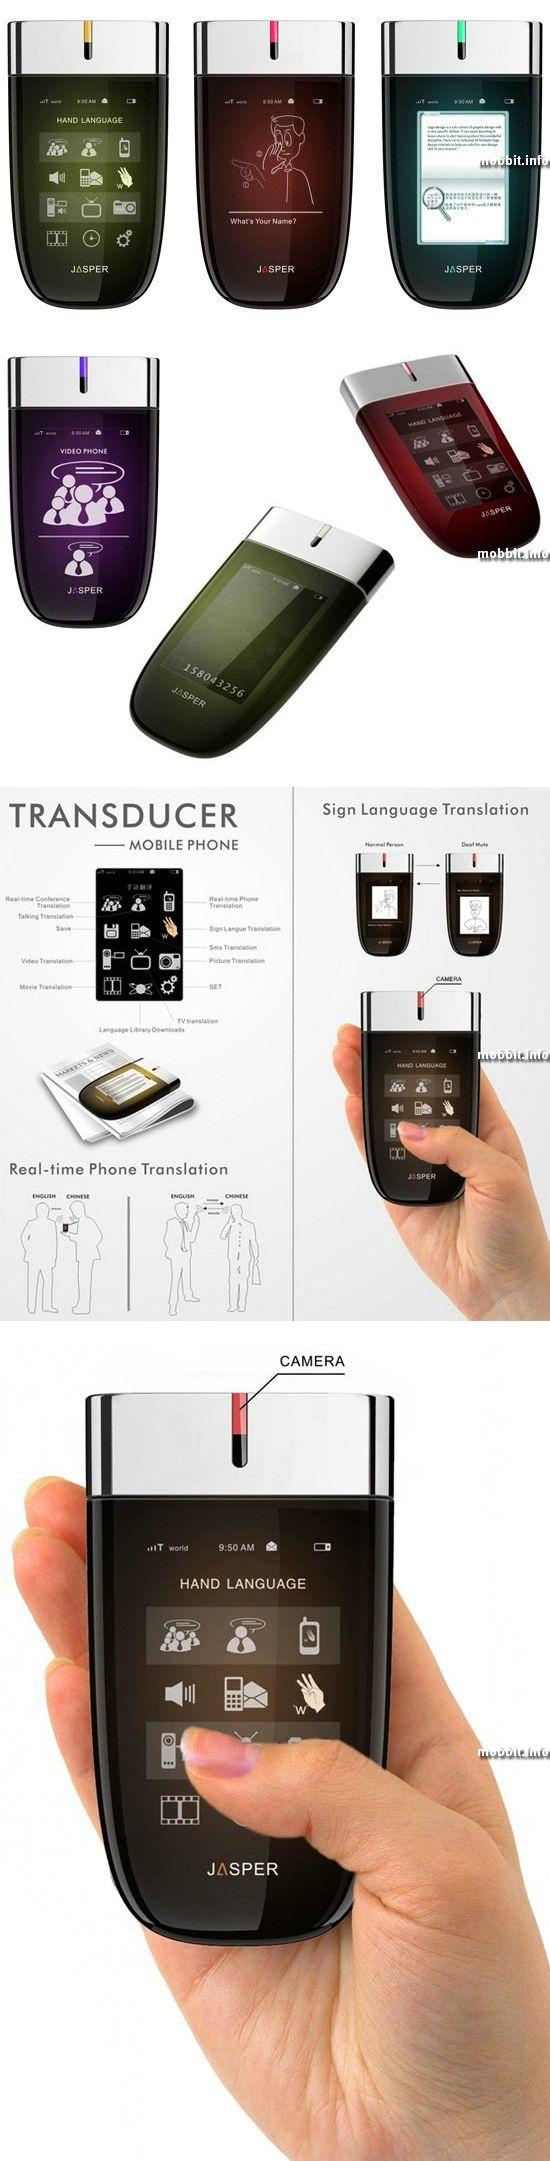 Transducer